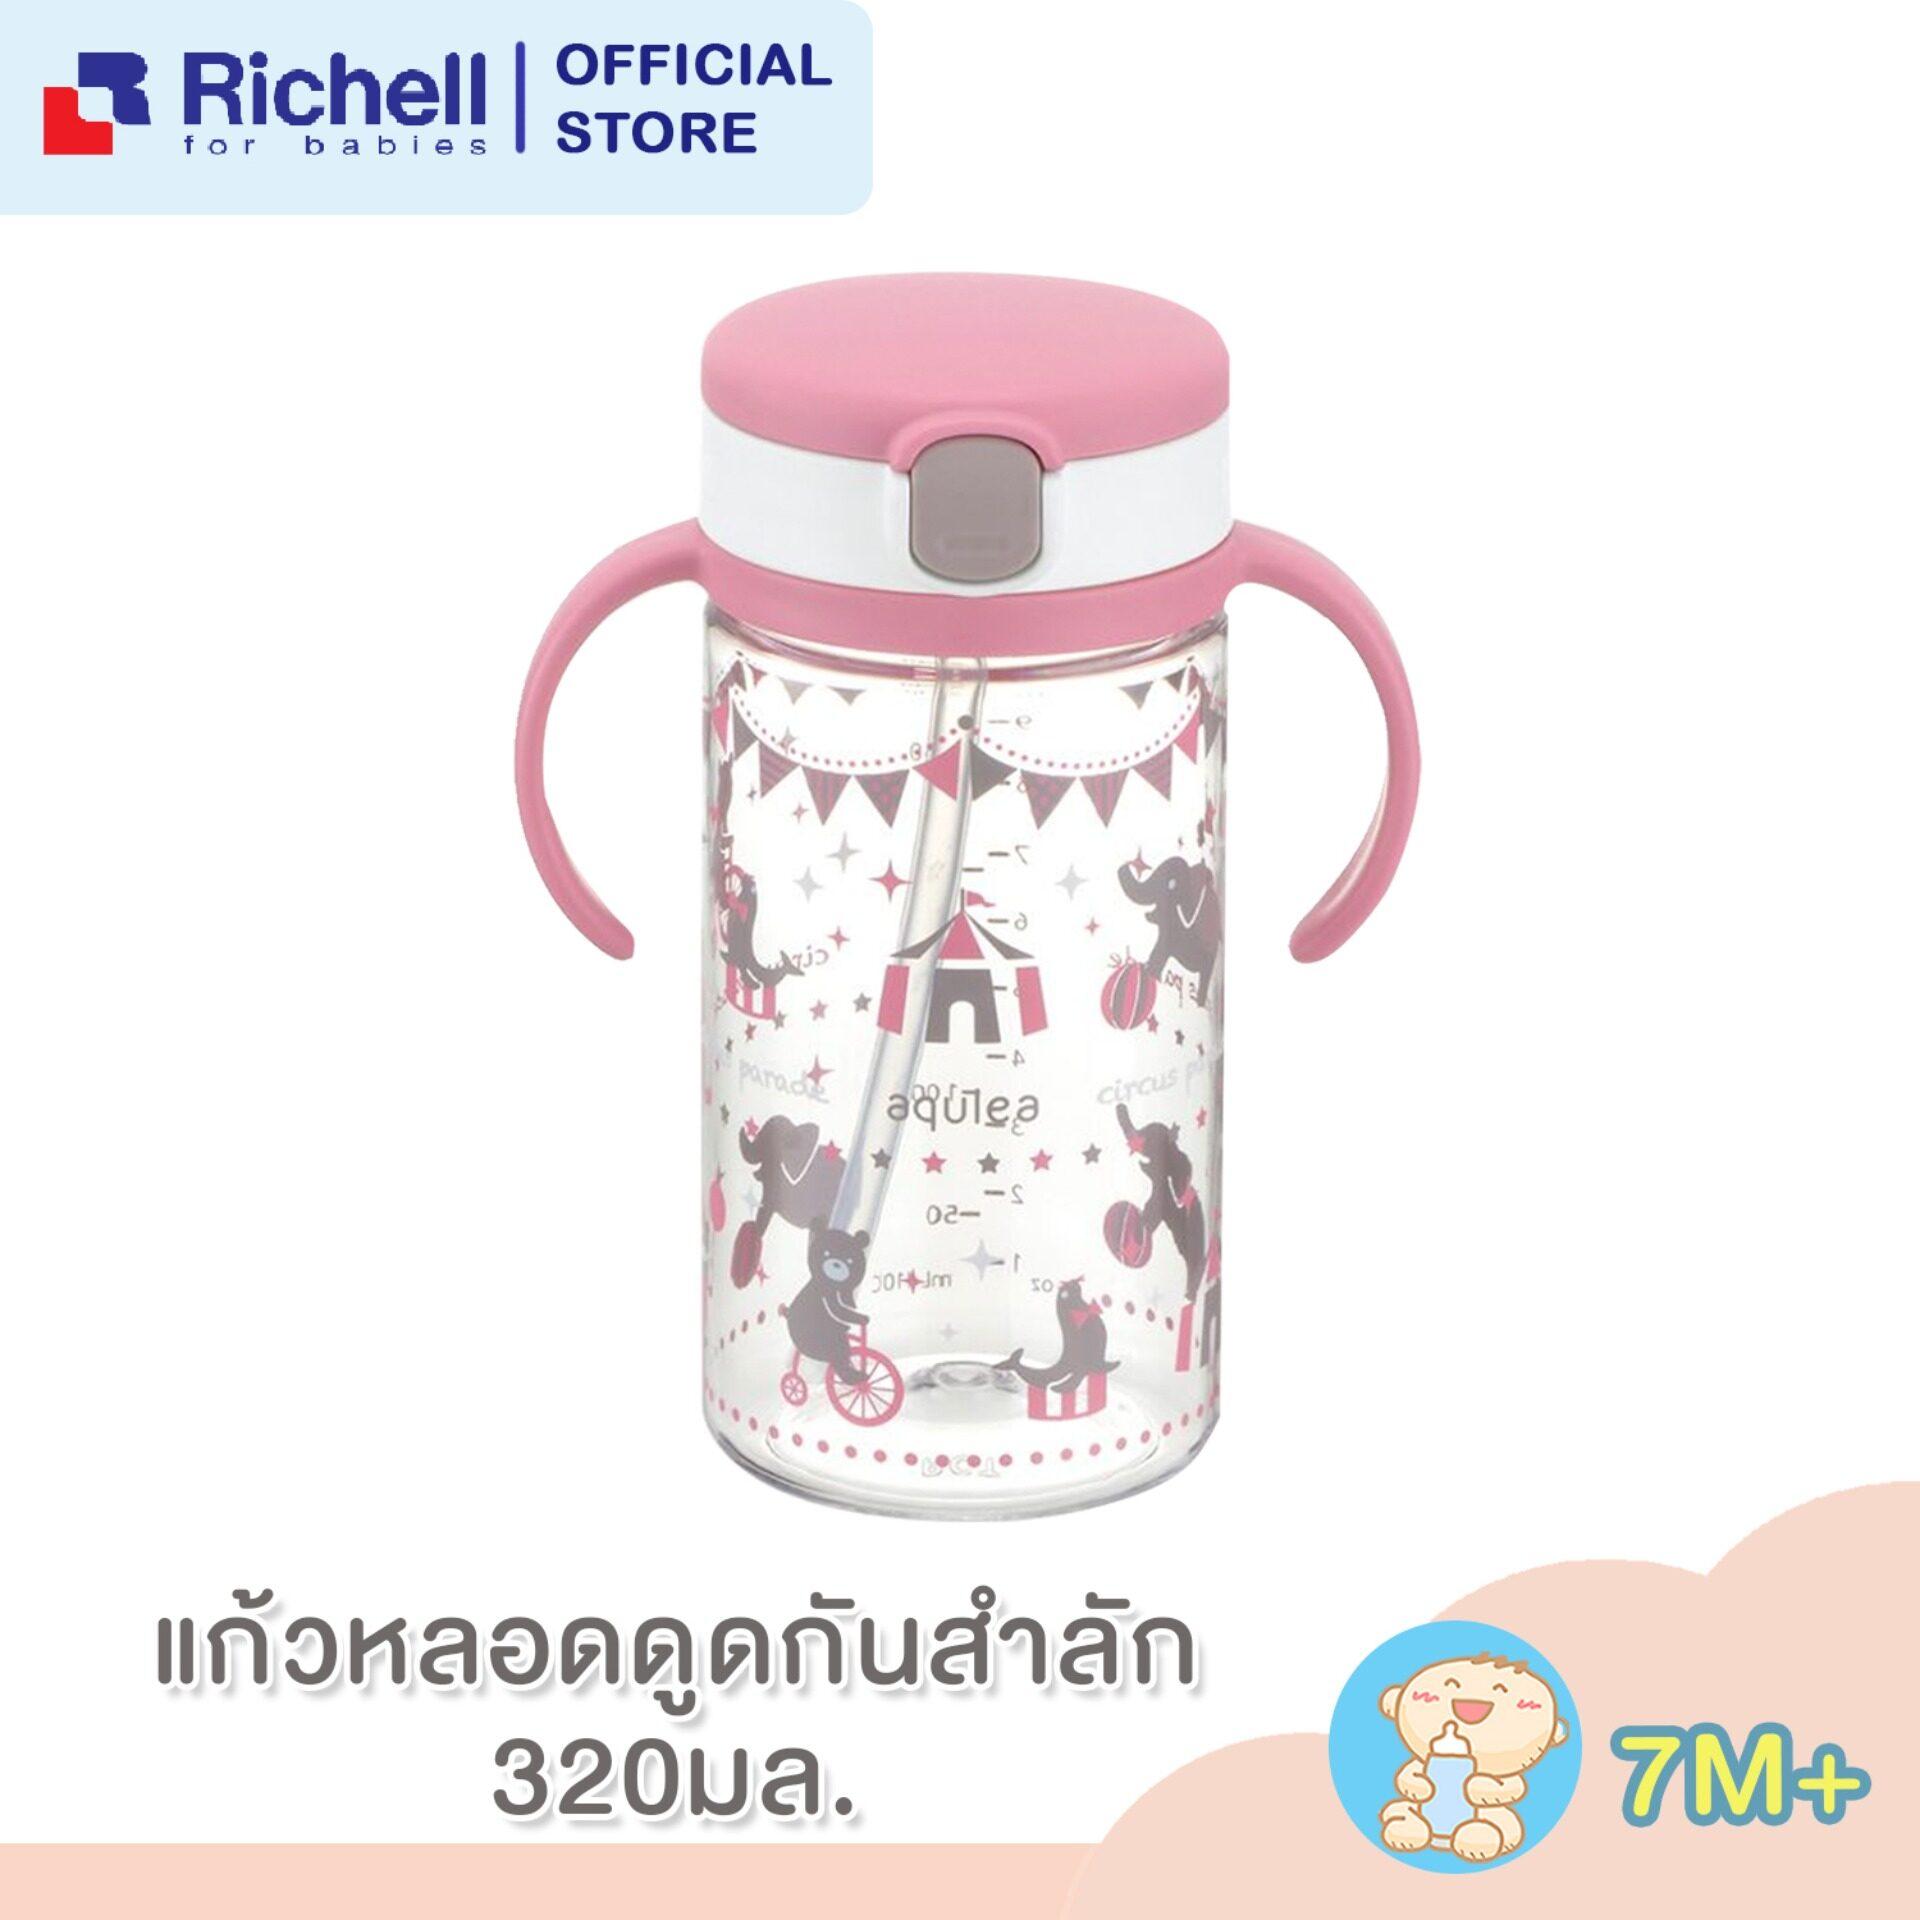 Richell ริเชล (ริชเชล/รีเชล) แก้วหลอดดูดกันสำลัก AQ Clear straw bottle mug 320R แก้วกันสำลัก แก้วสูญญากาศ ขนาด 320 ml พกพาสะดวก แก้วทรงสูง